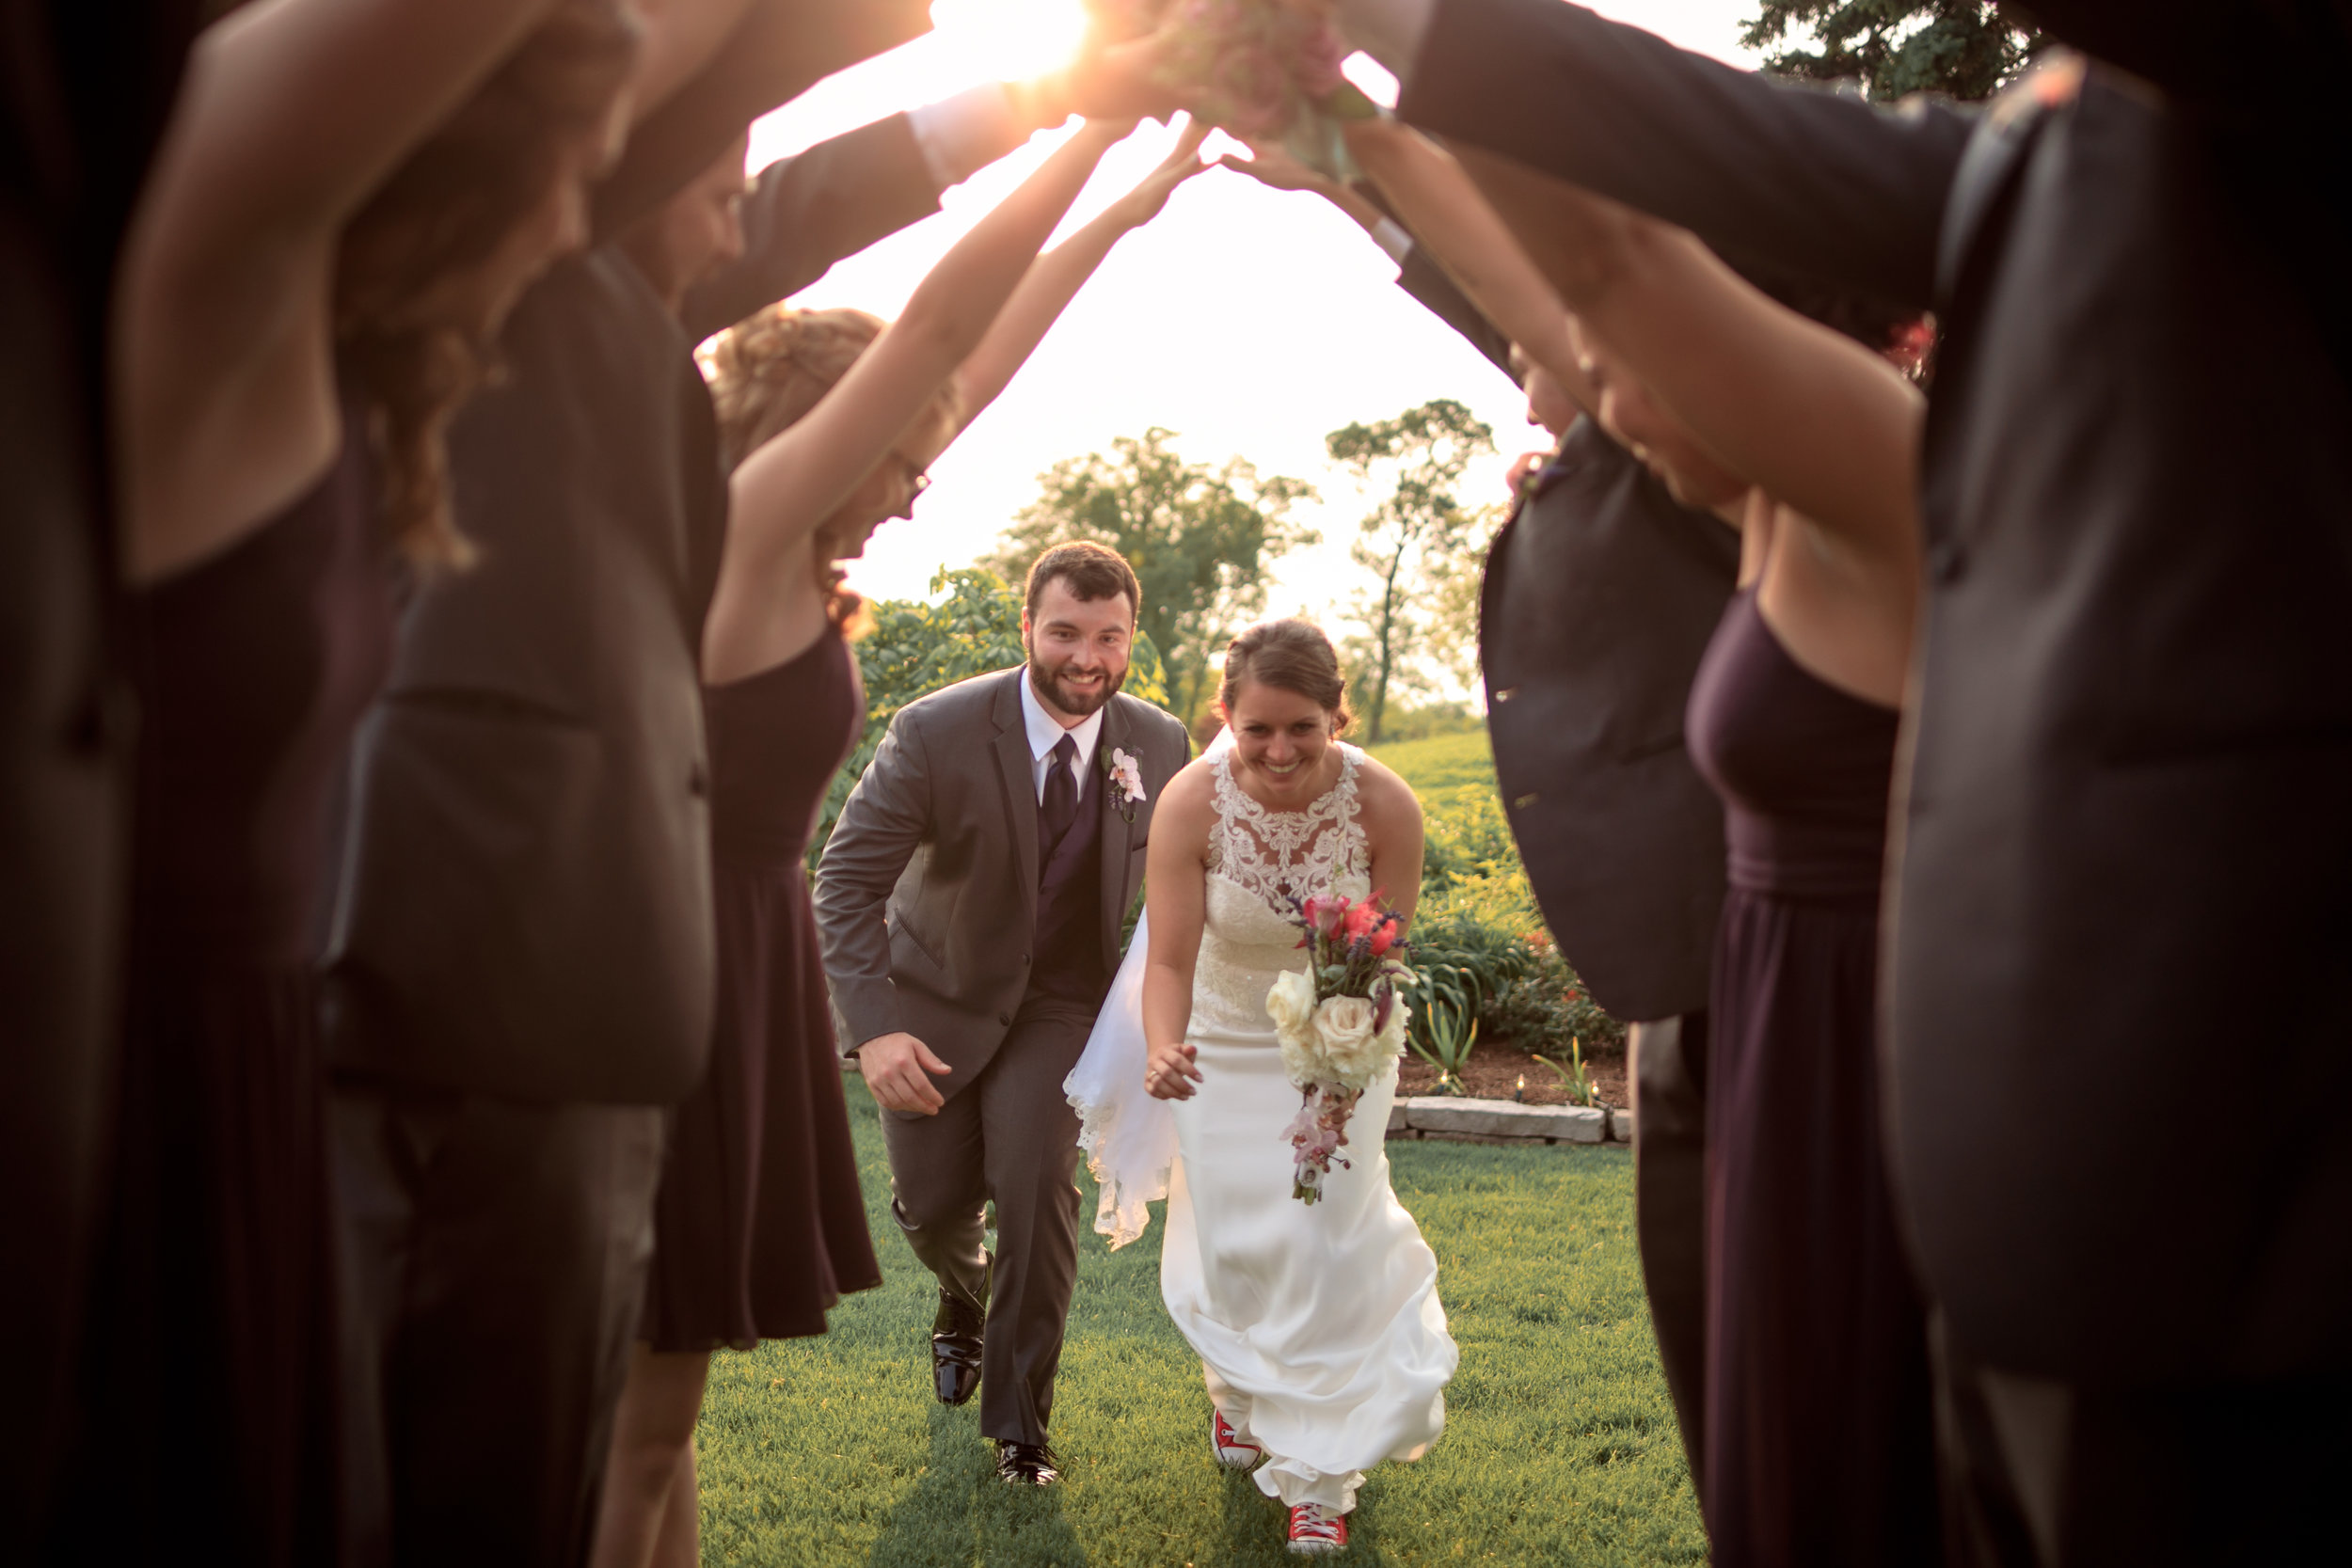 silver-lake-orland-park-wedding61.jpg